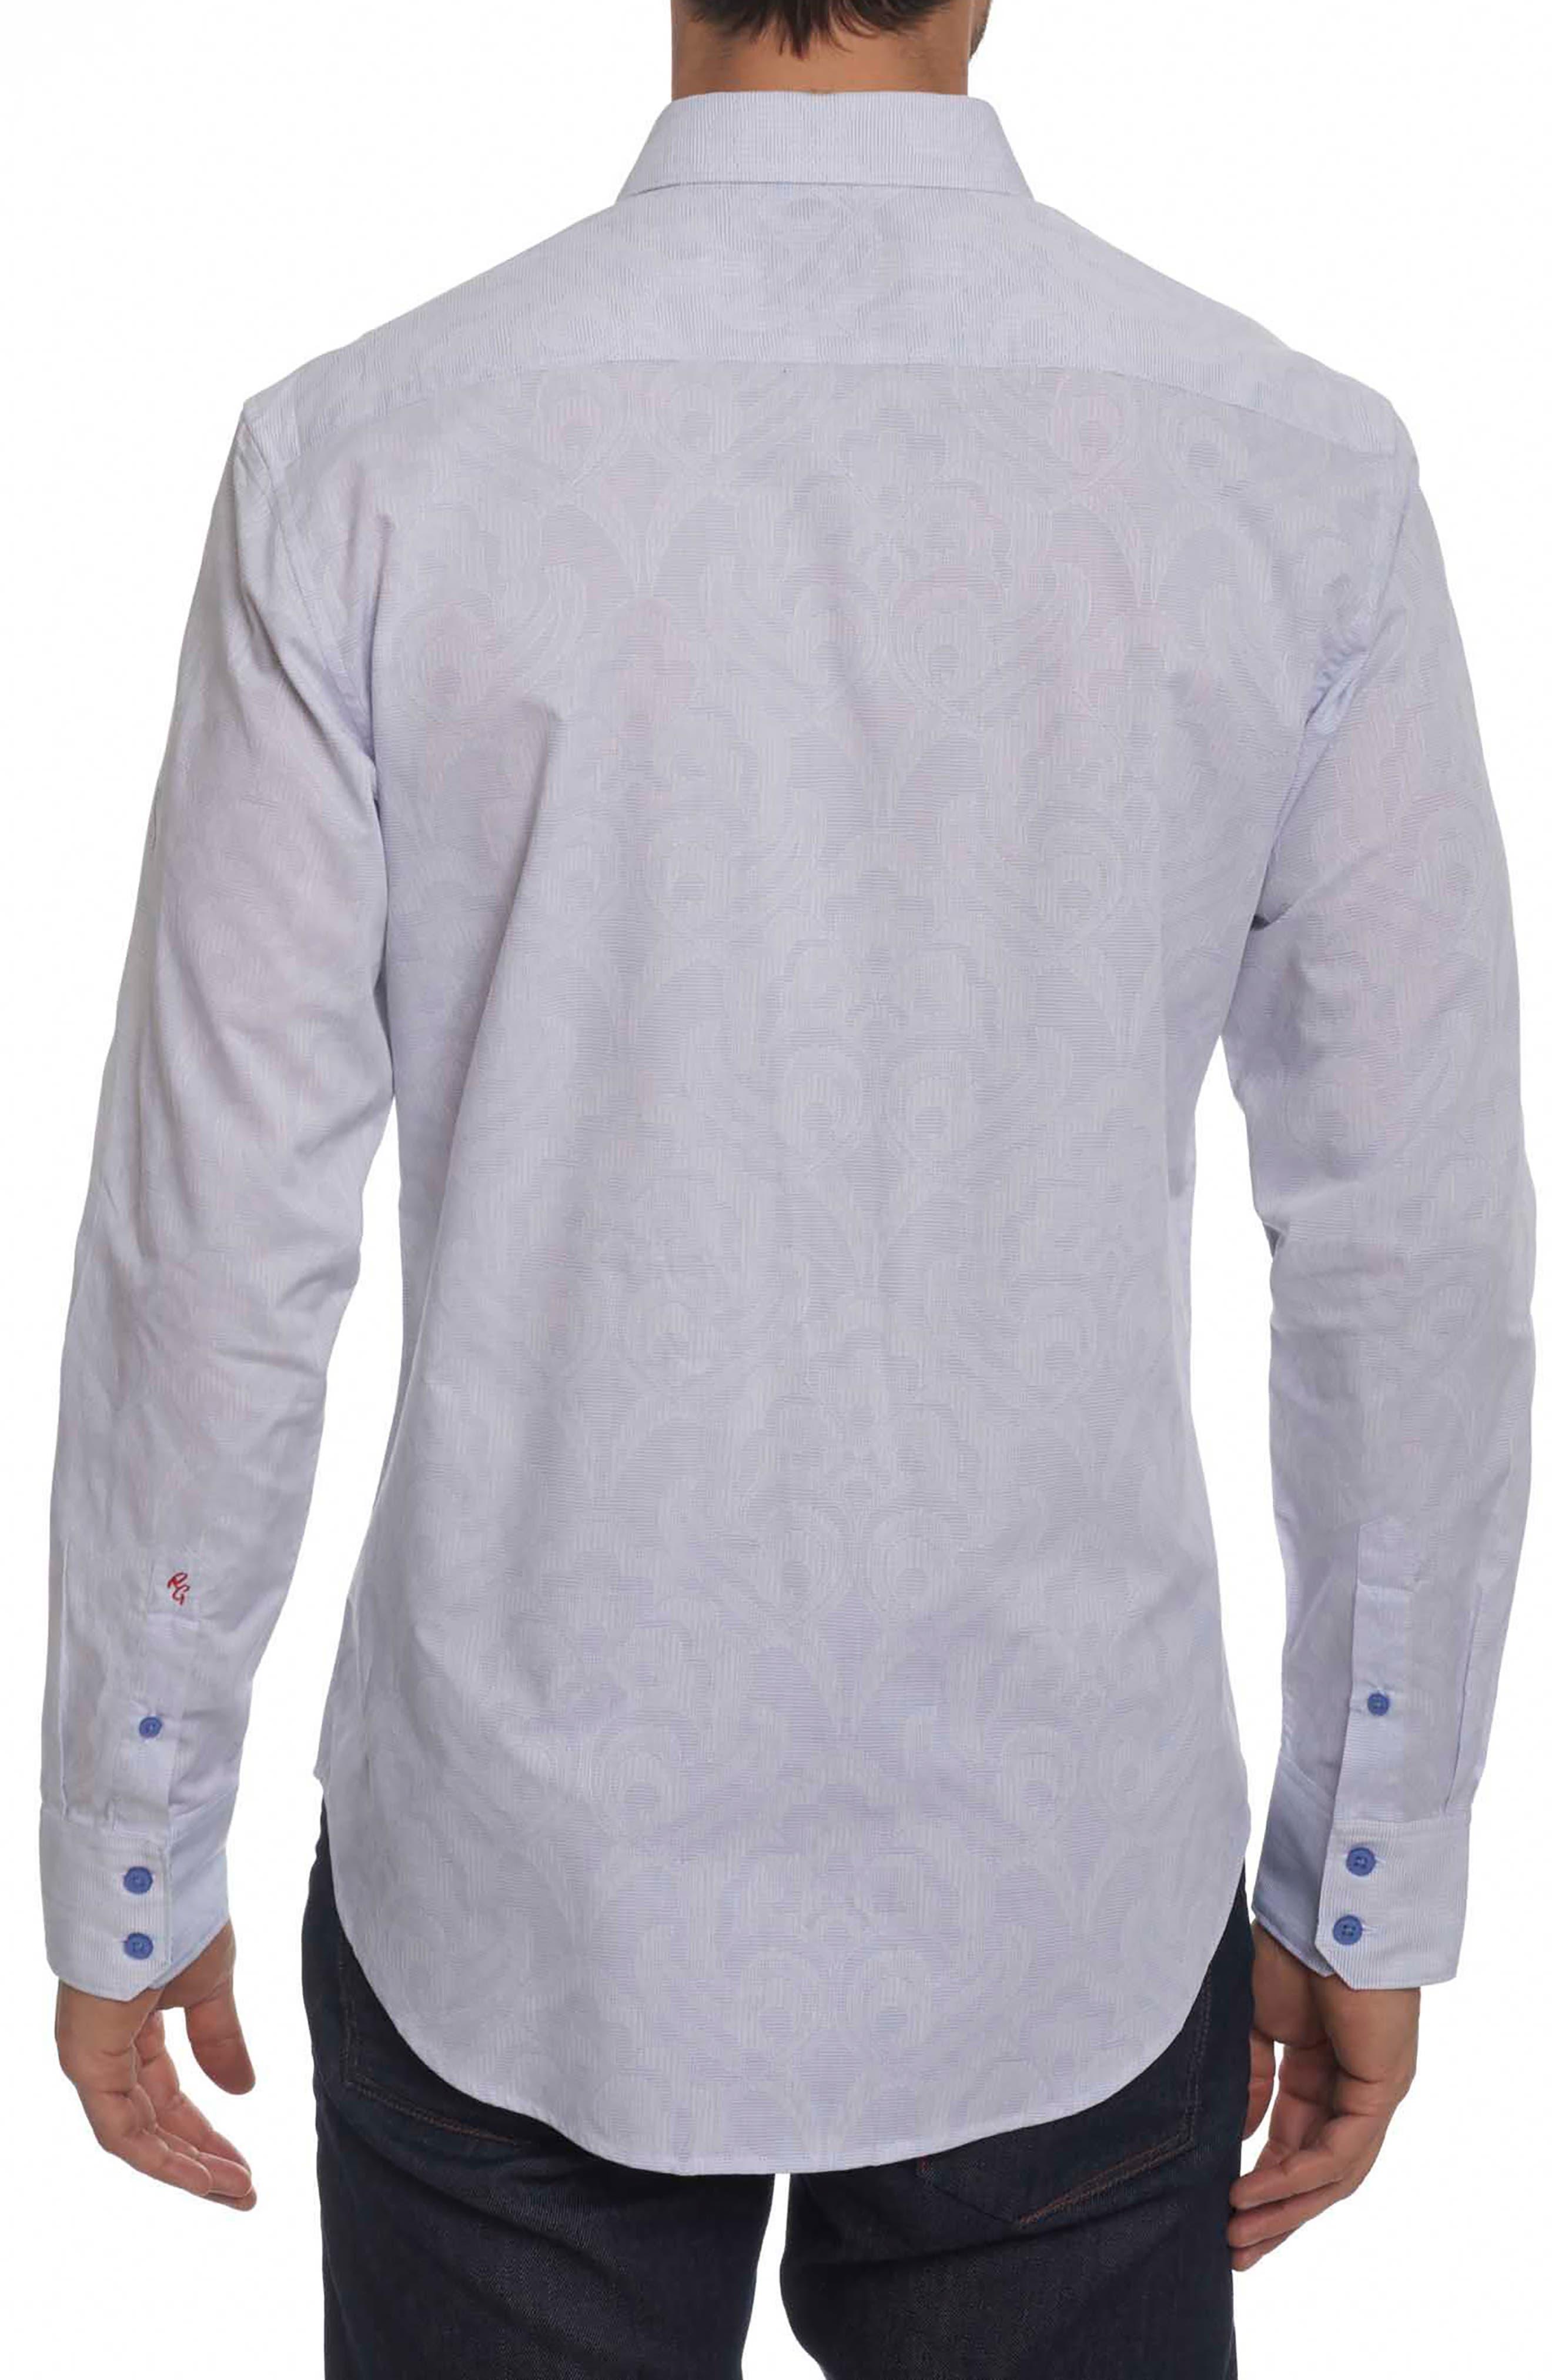 Alex Bay Classic Fit Sport Shirt,                             Alternate thumbnail 2, color,                             White